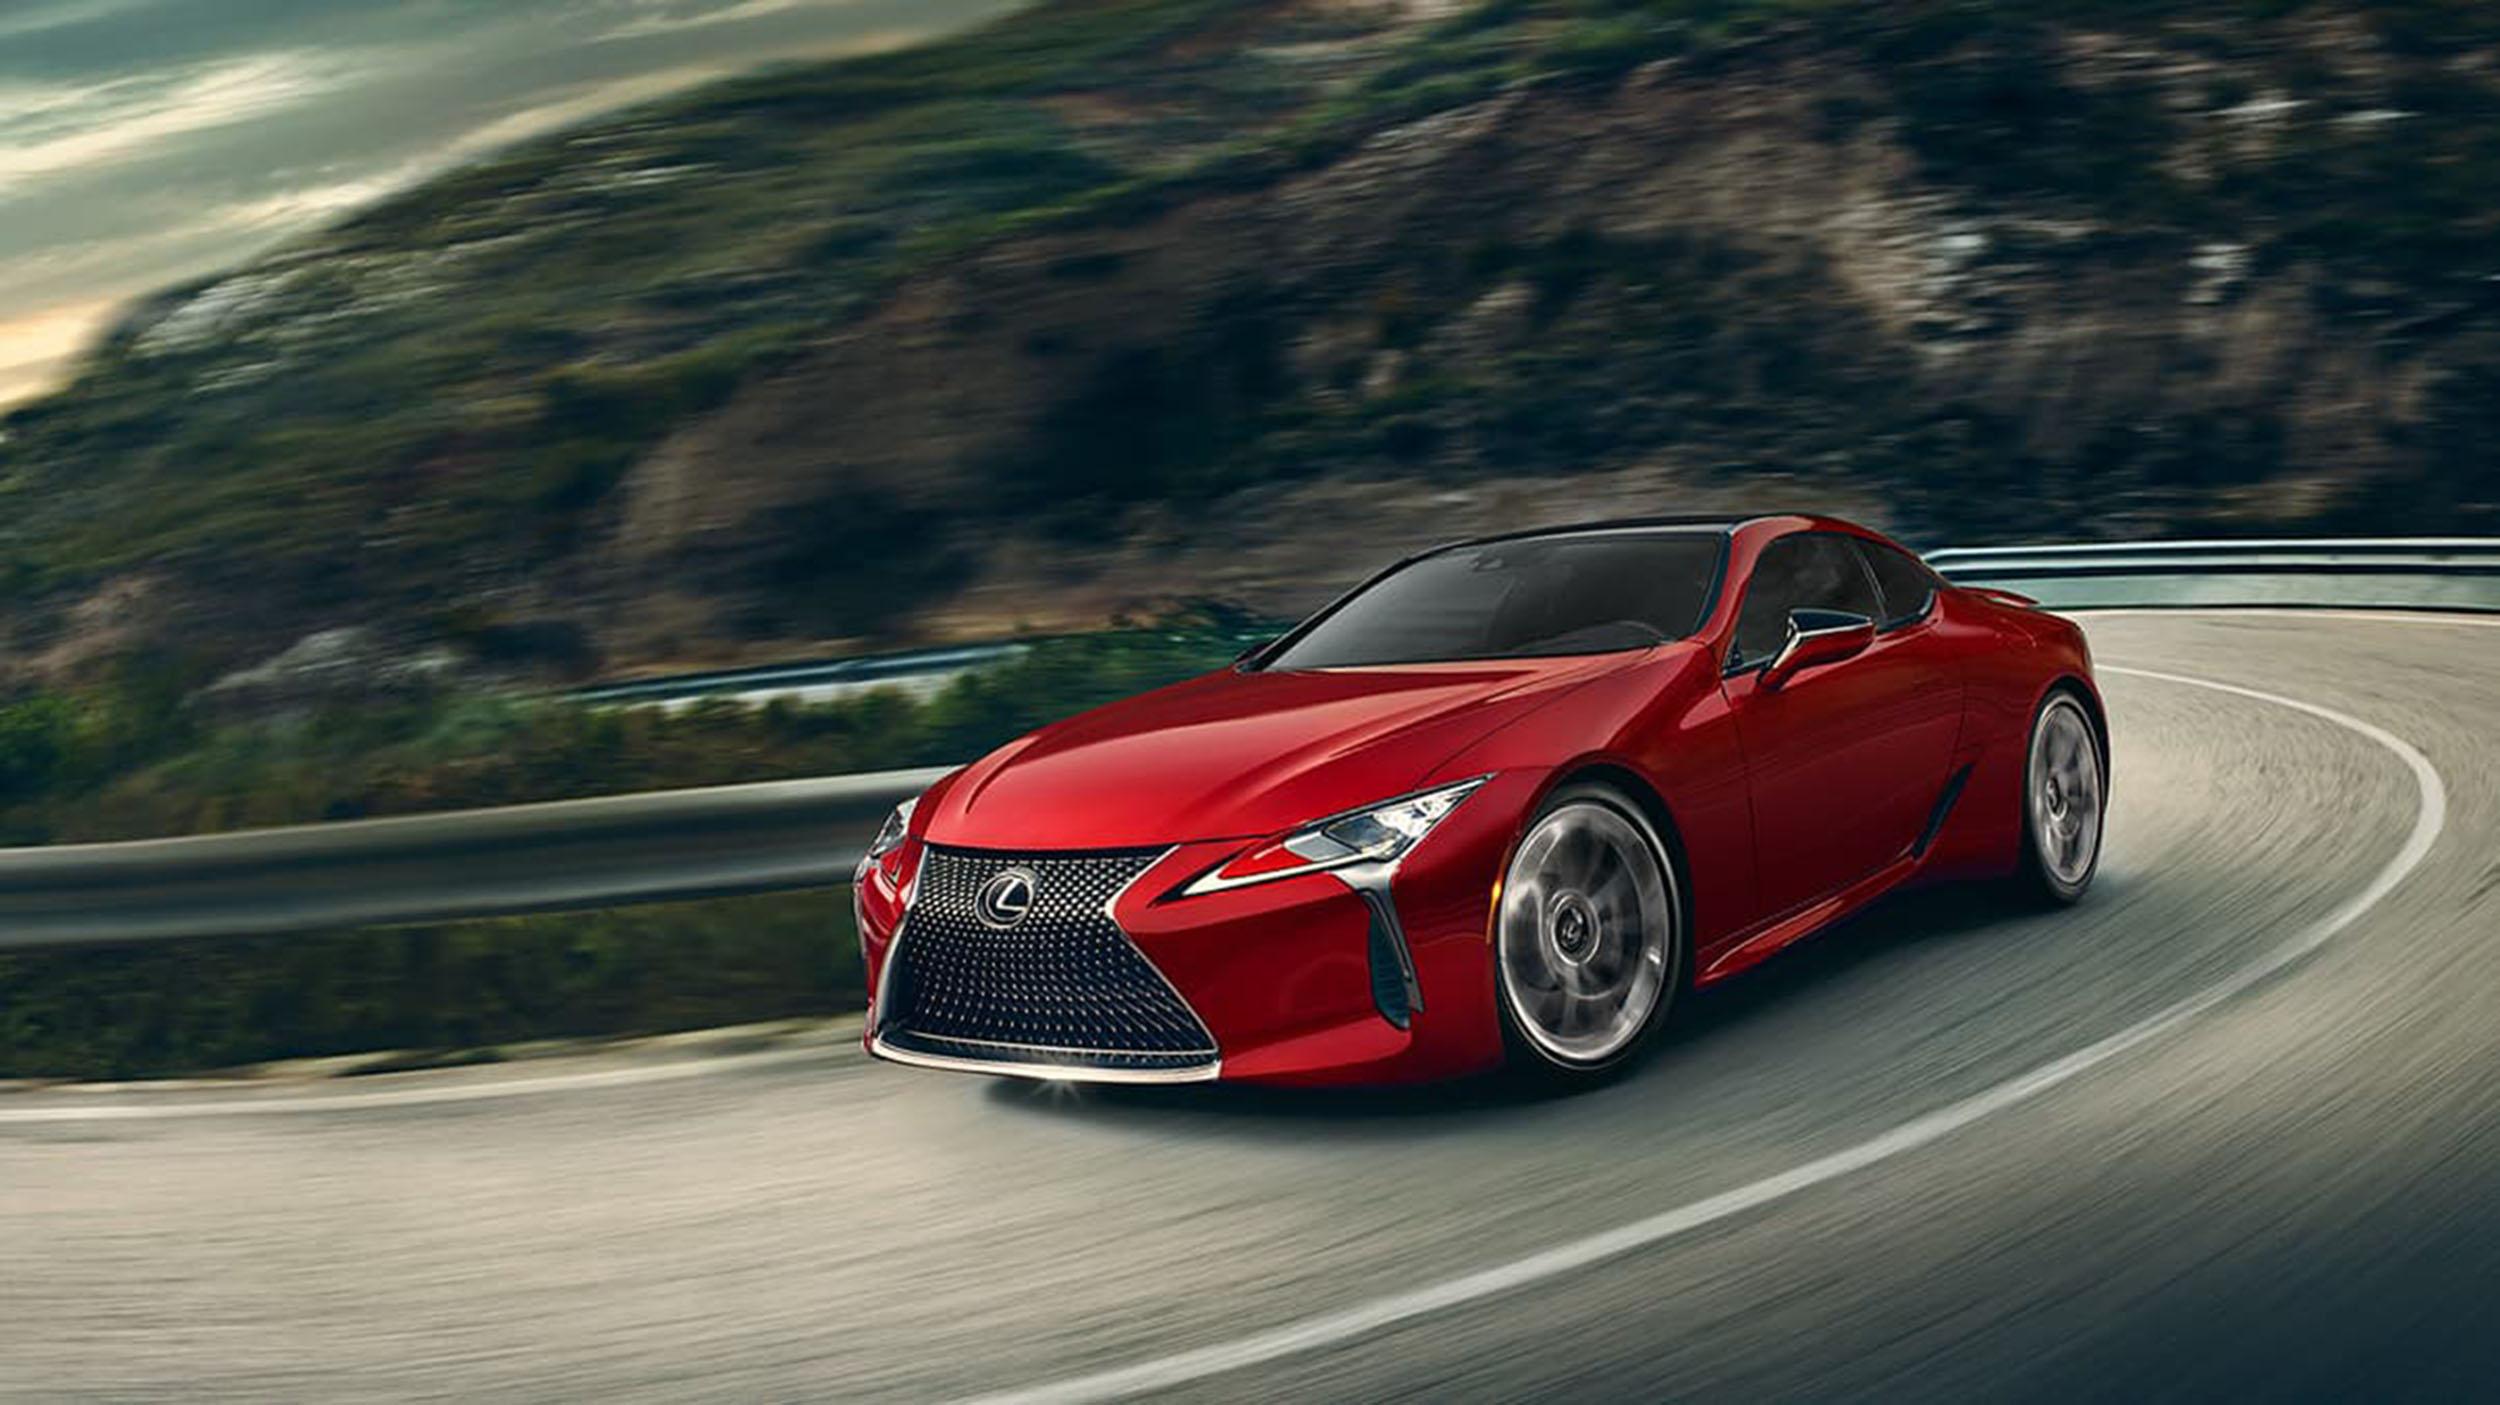 Lexus LC500 – Sleek, attractive and powerful